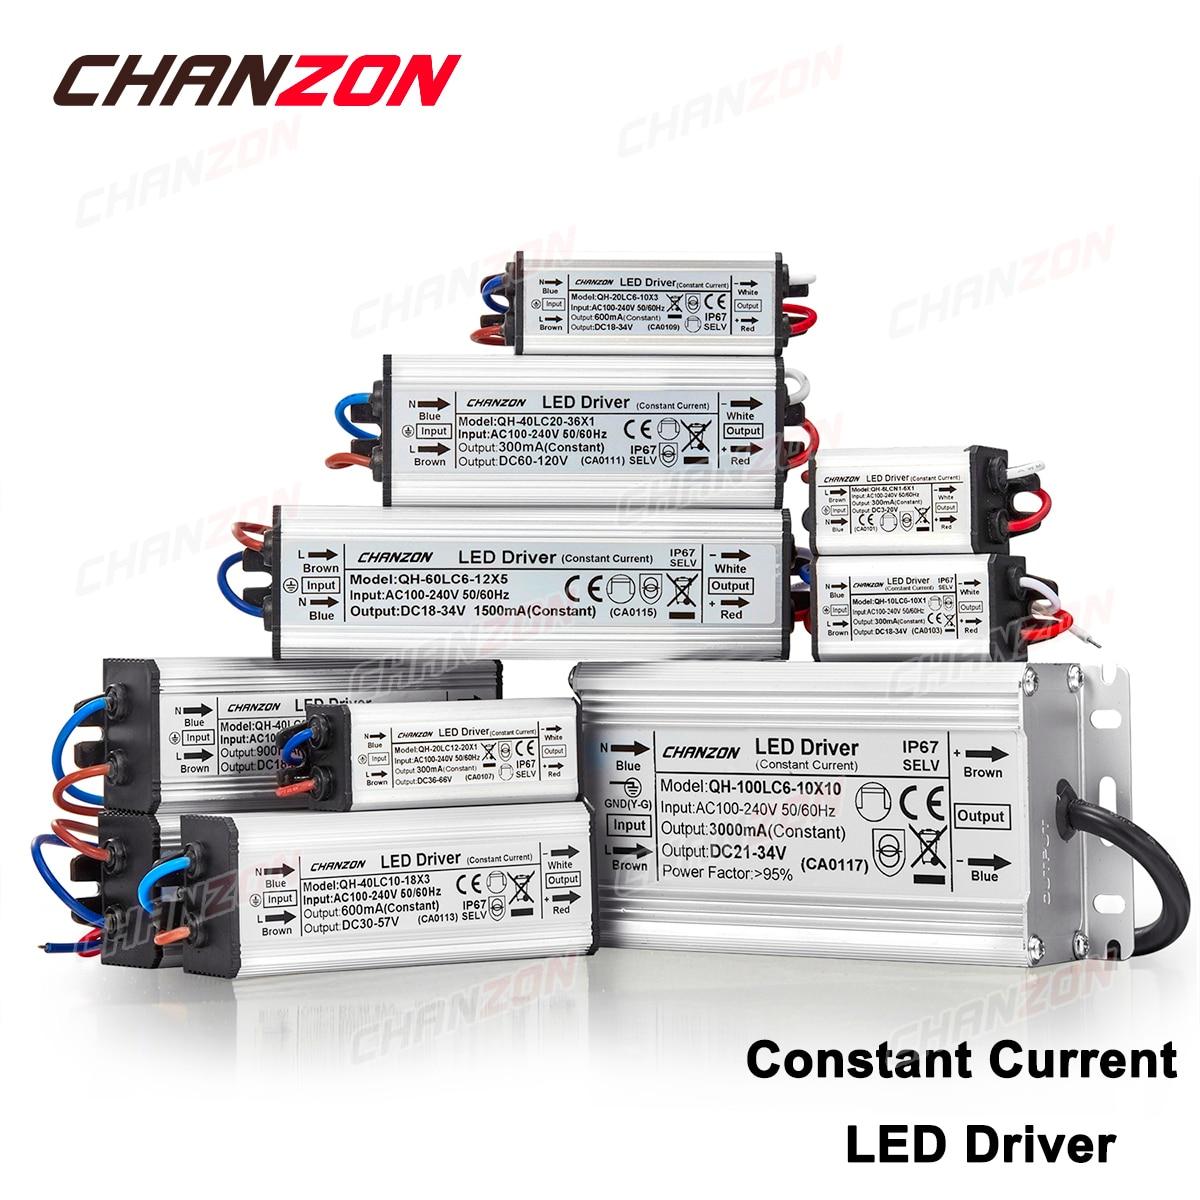 Constant Current LED Driver Waterproof 1W 3W 5W 10W 20W 30W 36W 50W 100W AC 100V-240V Lighting Transformer Power Supply Adapter